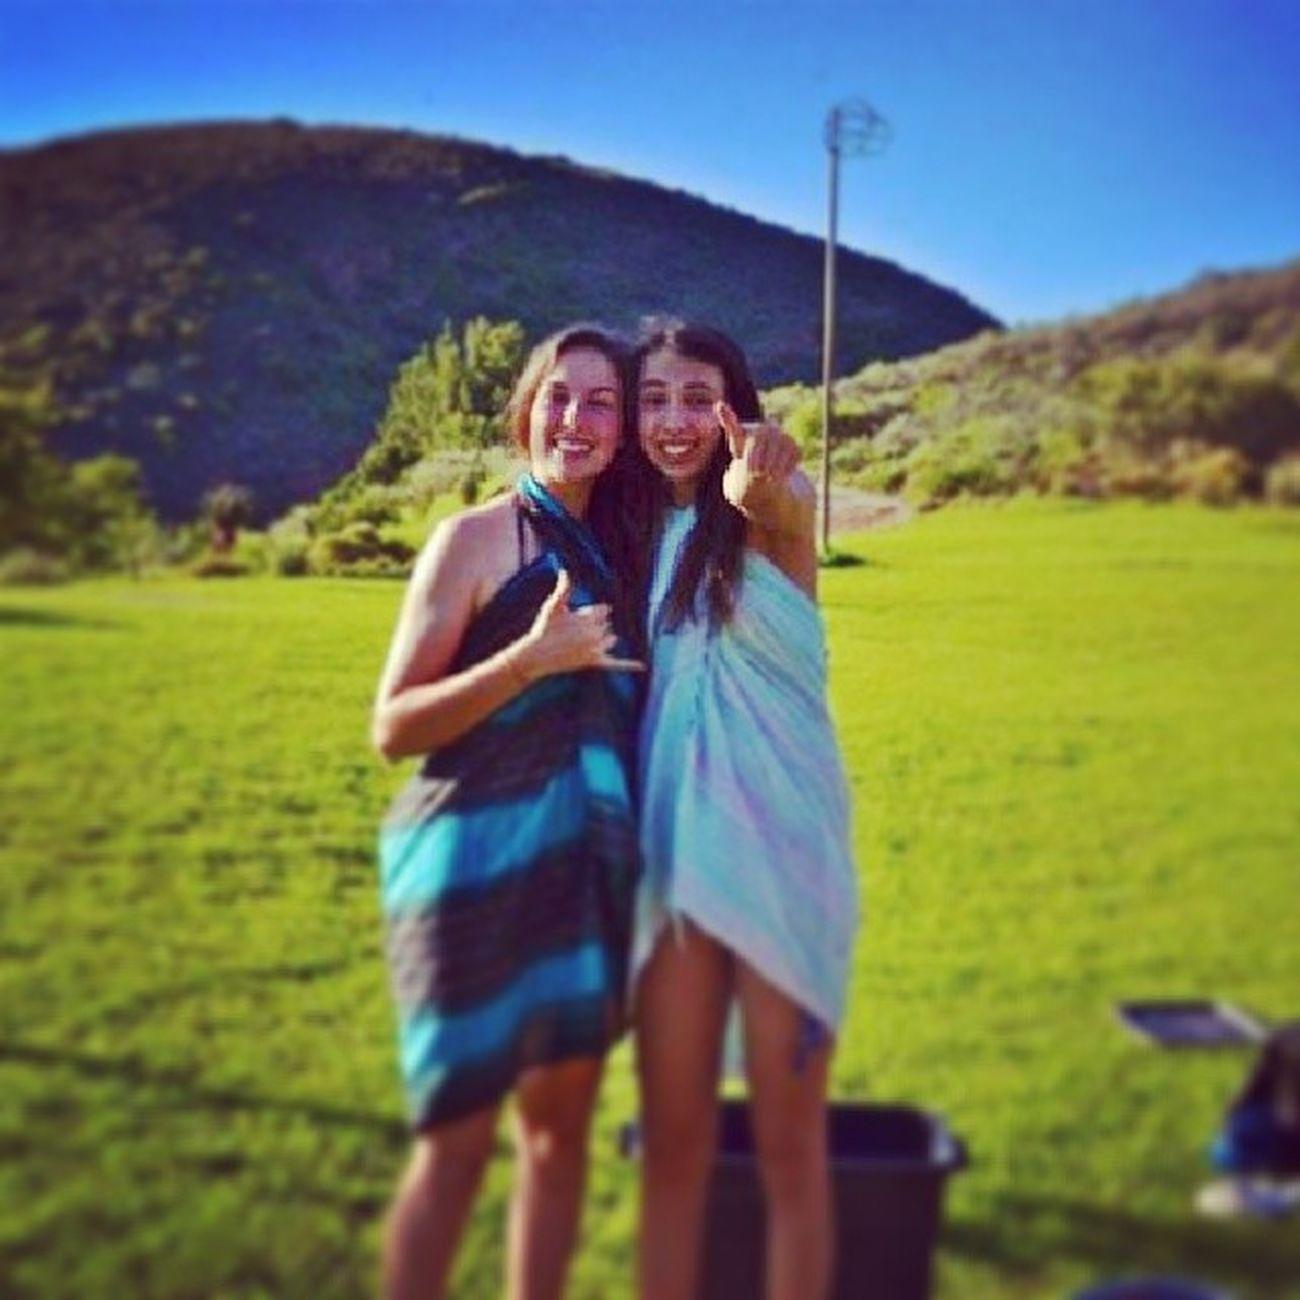 Gkc Summer Southafrica Indiekids smiles goodvibes kickback garden sunshine love